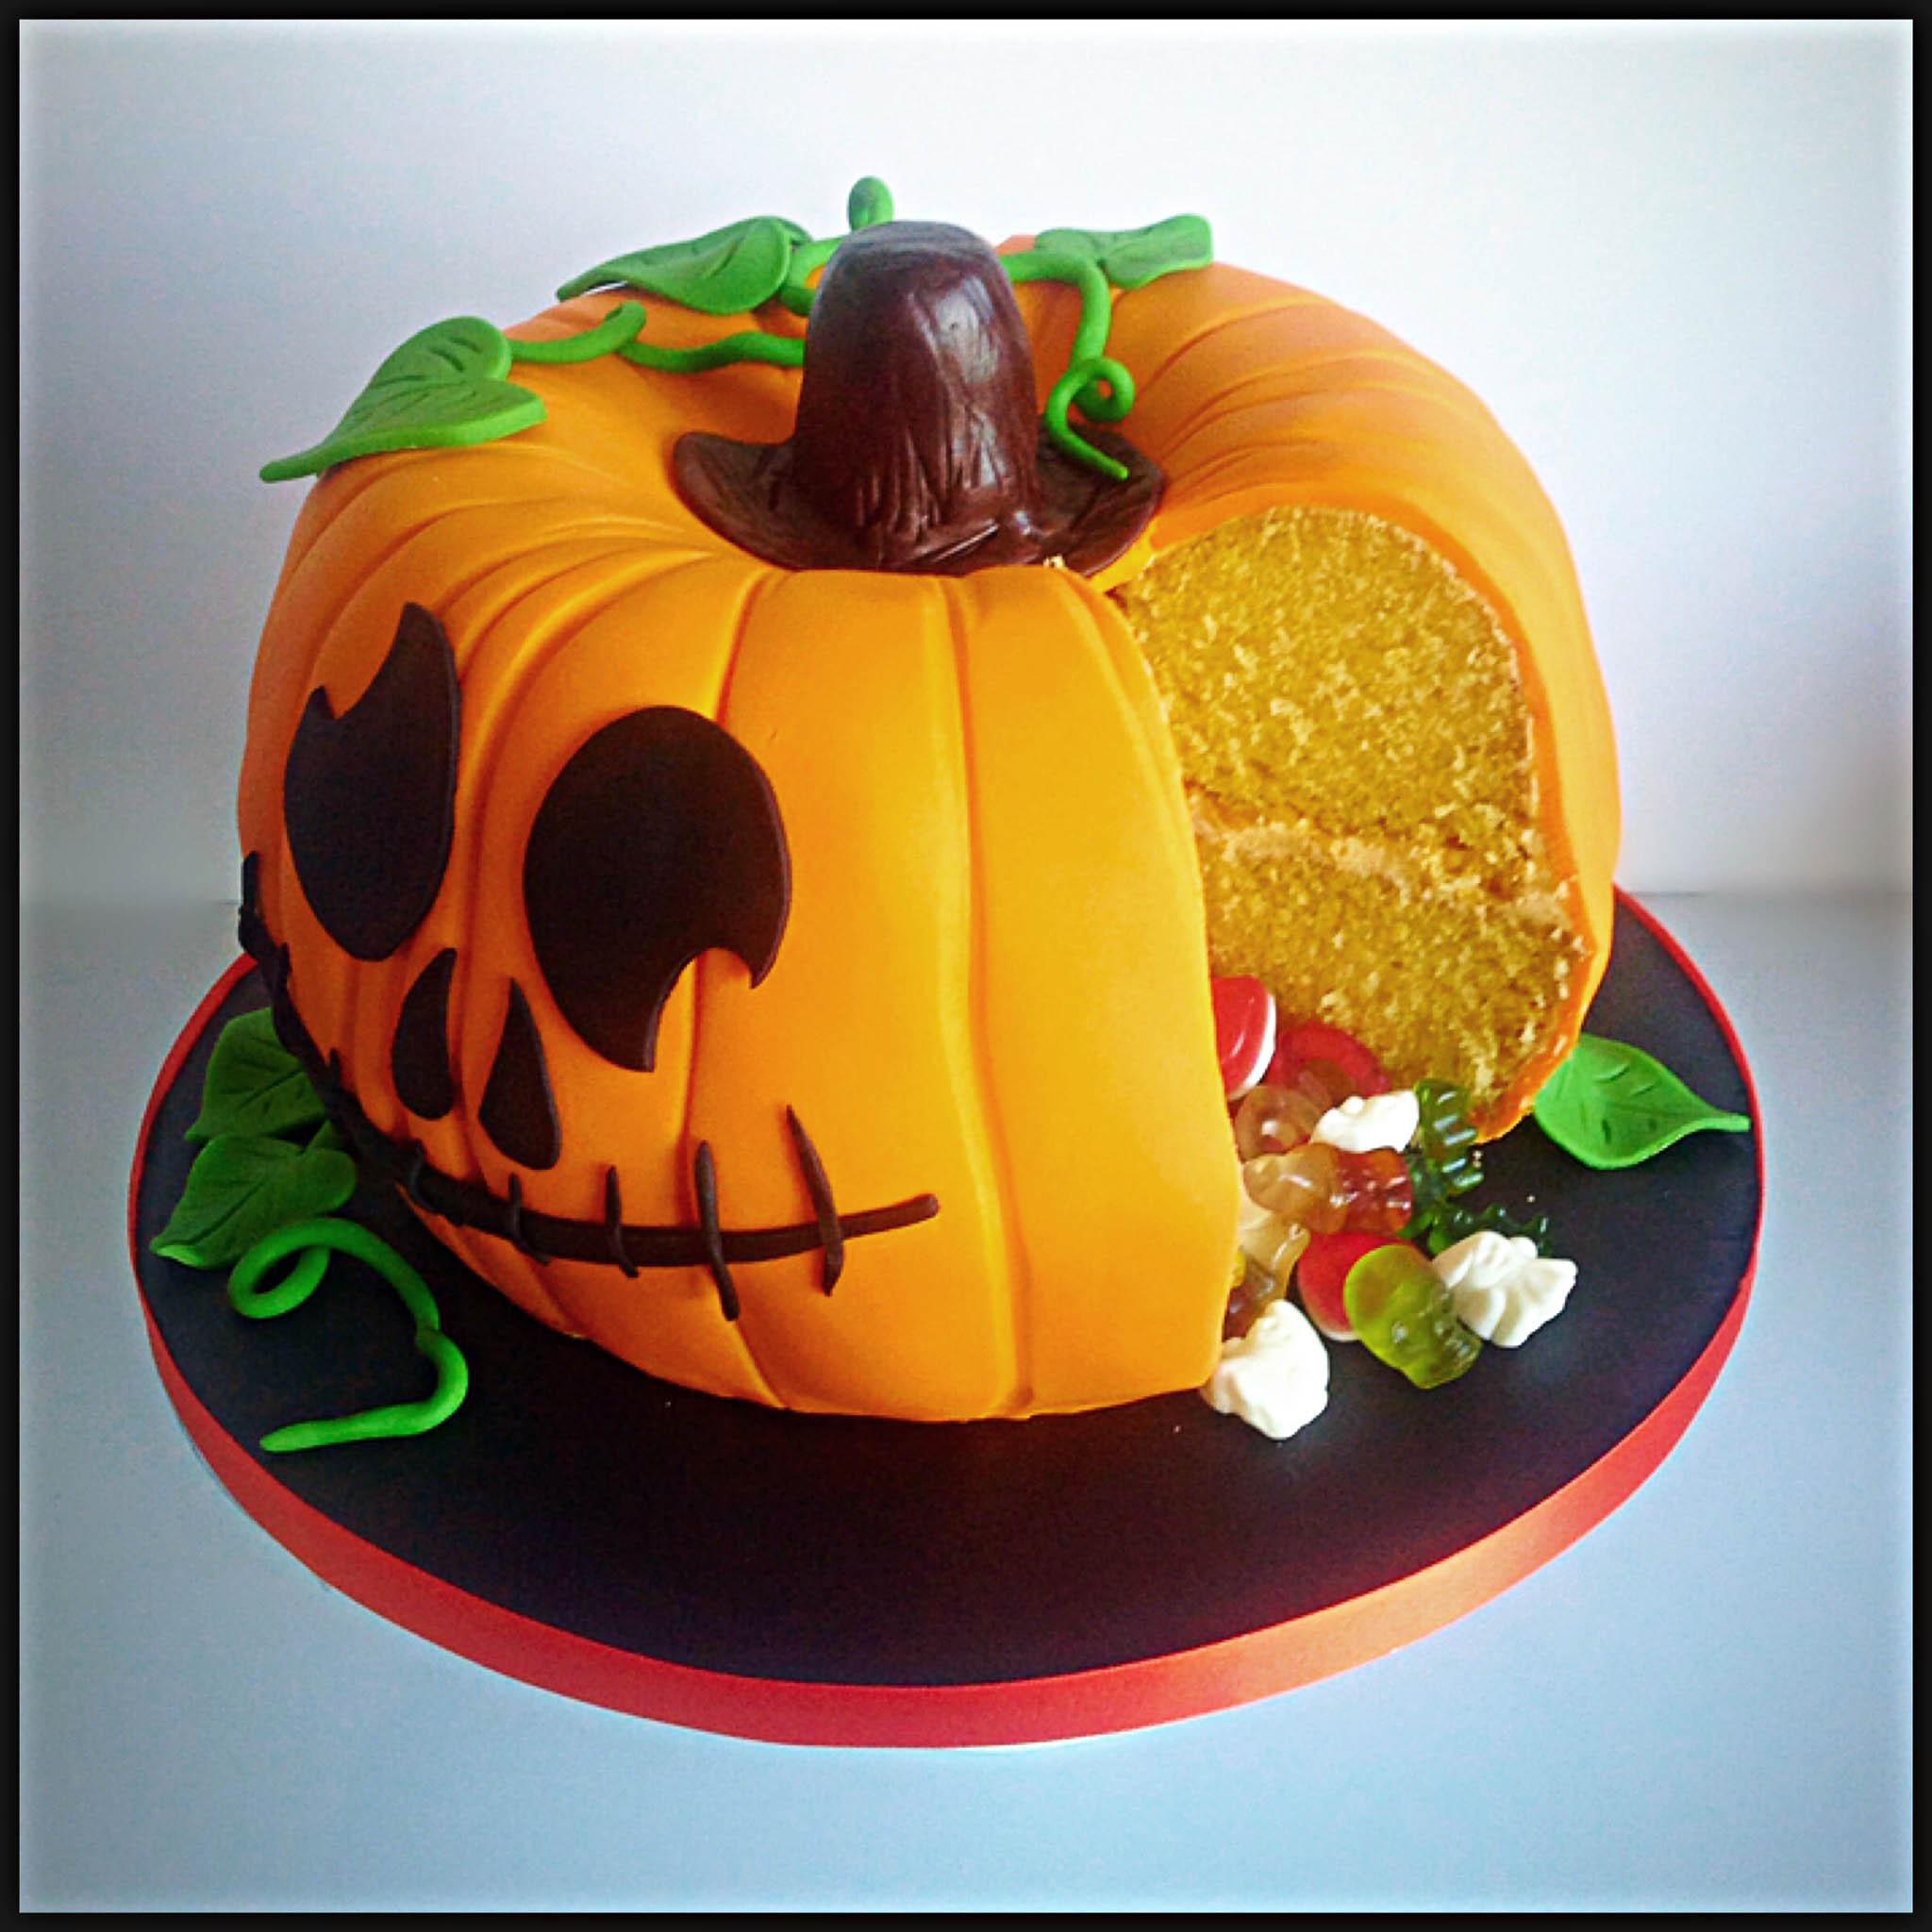 Halloween Pumkin Cakes  How To Make A Party Pumpkin Piñata Cake